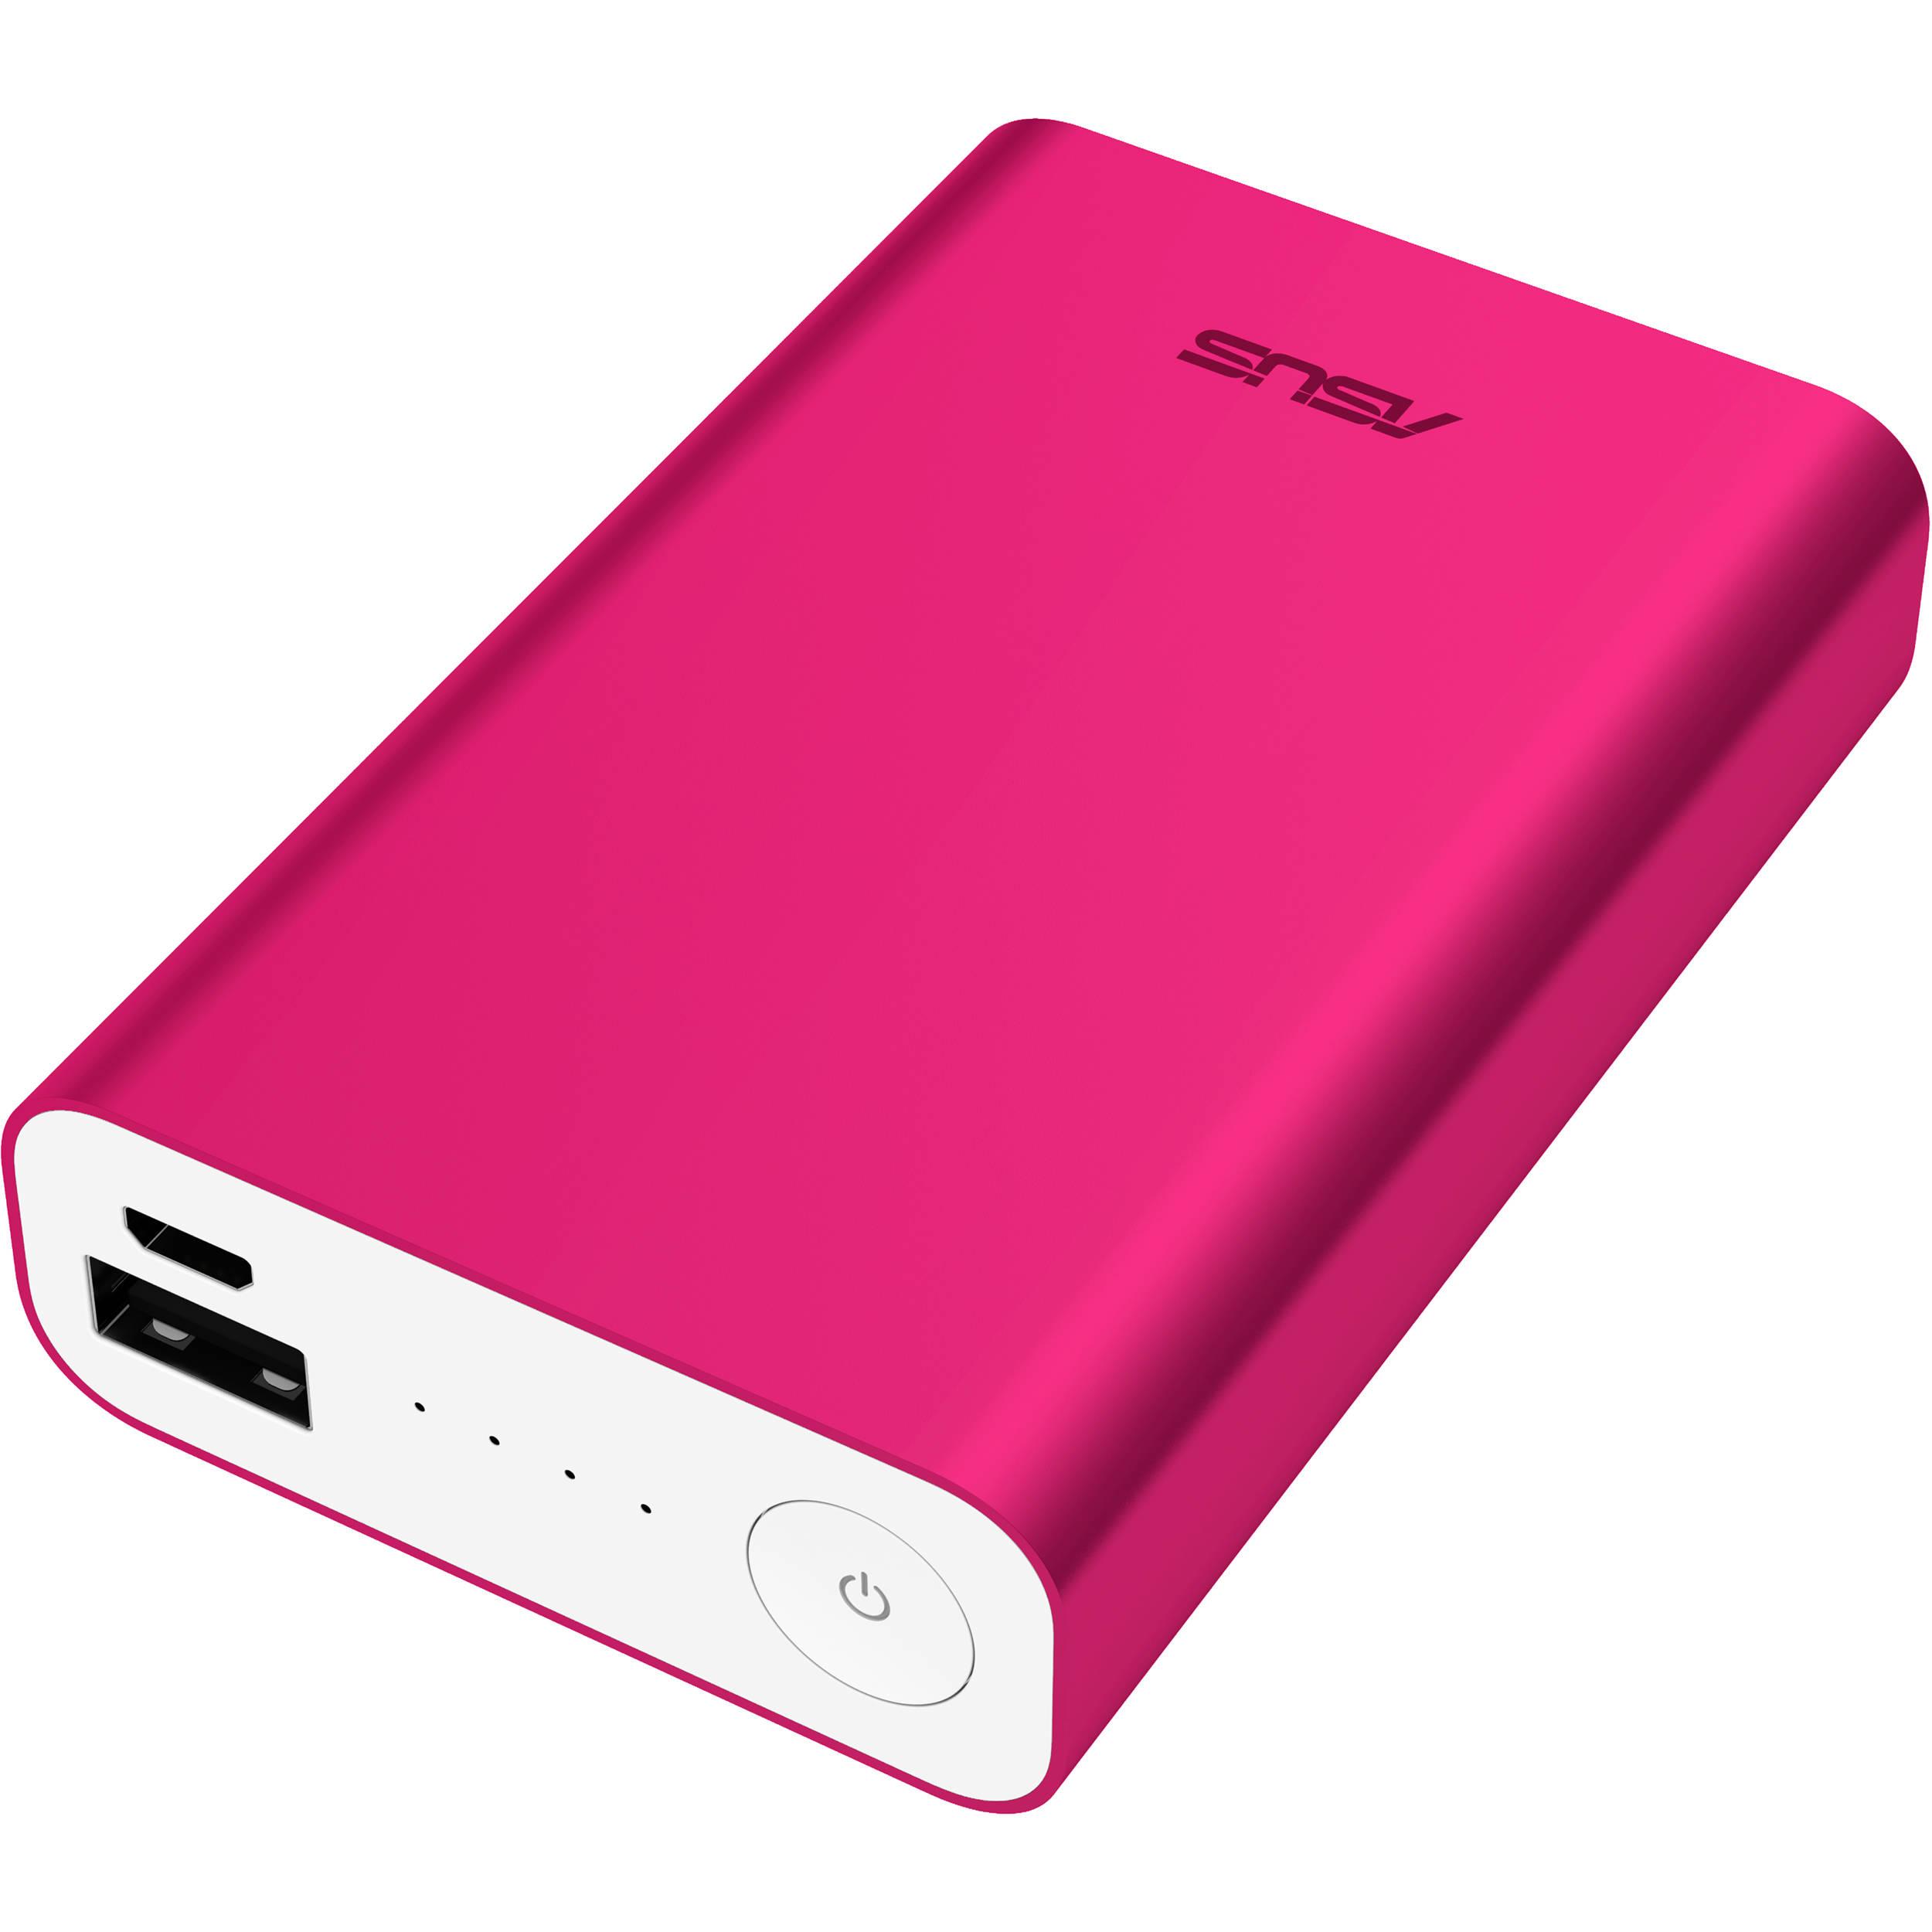 Merk Light Stand Yang Bagus: ASUS ZenPower 10050mAh Portable Battery Pack 90AC00P0